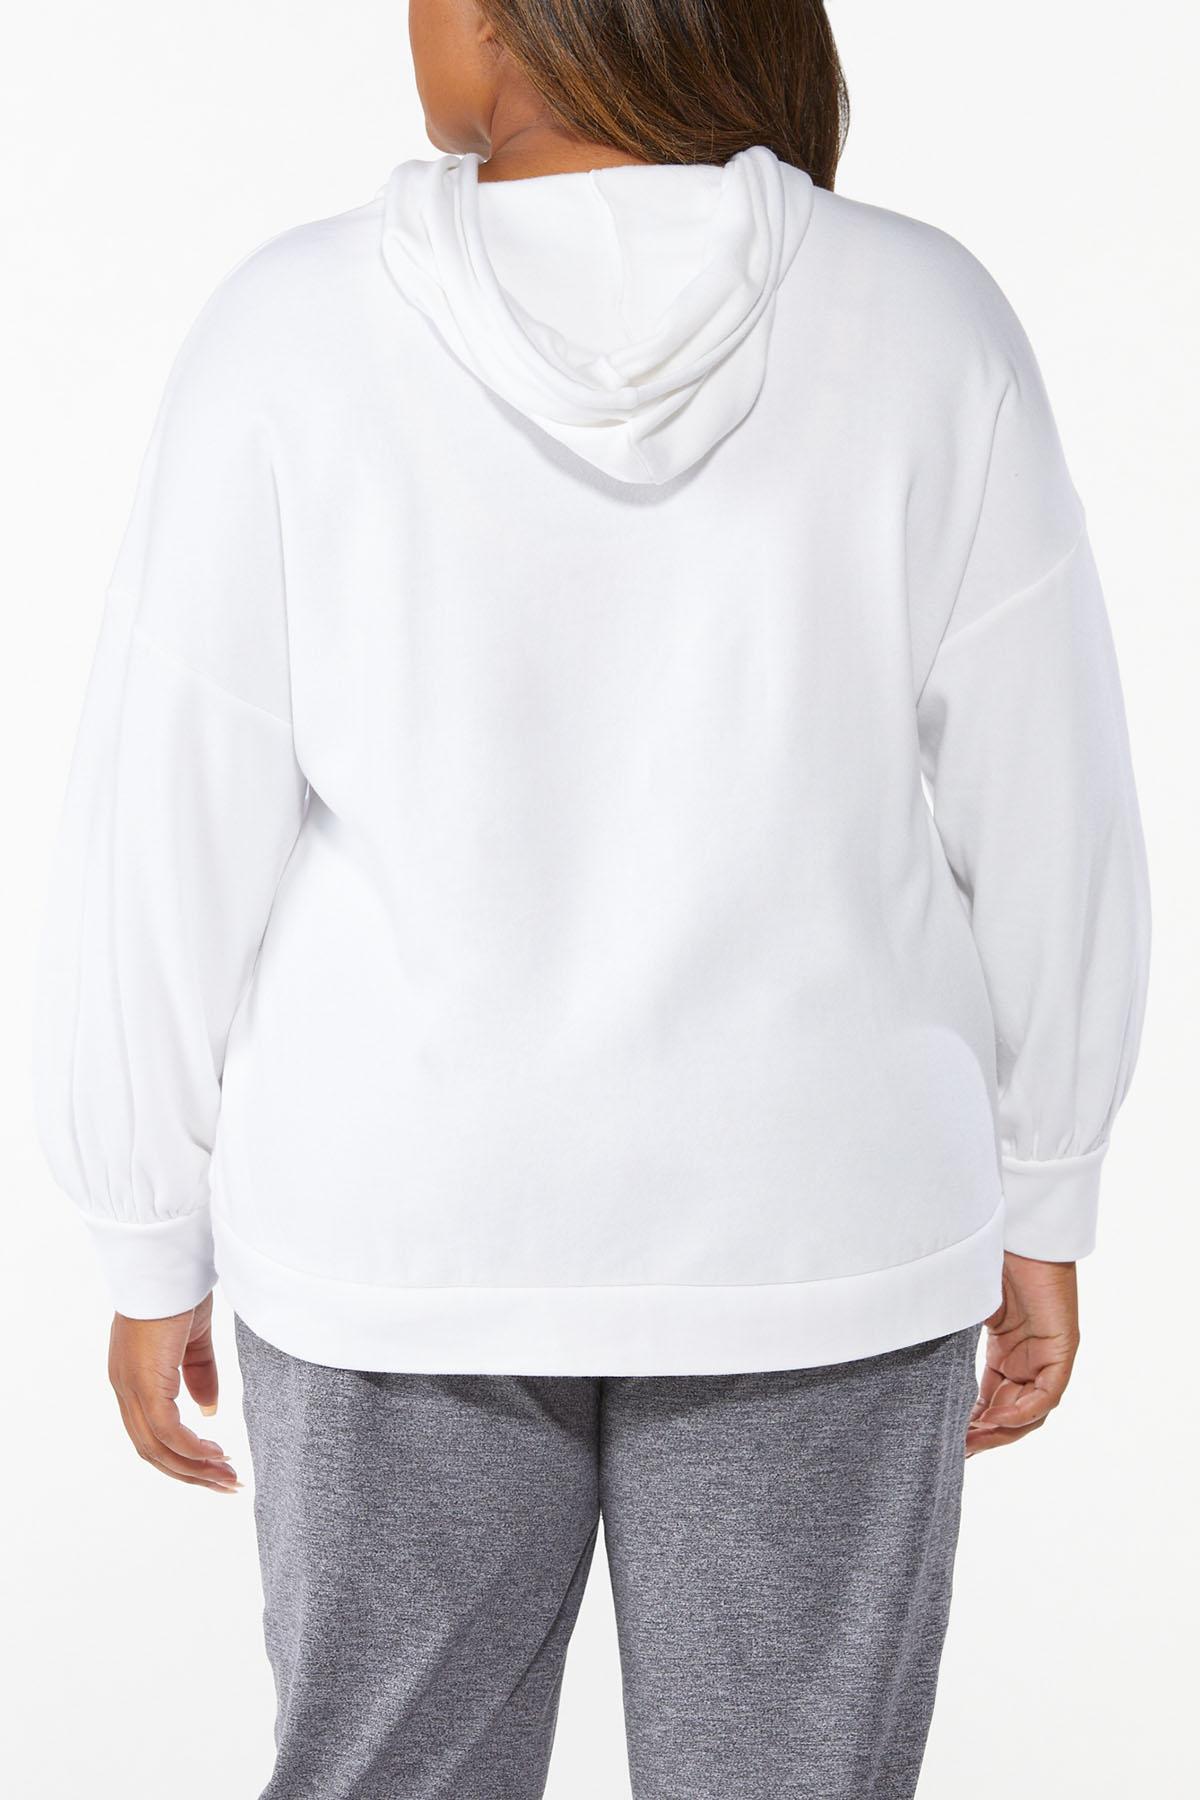 Plus Size Cutout Fleece Hoodie (Item #44668452)